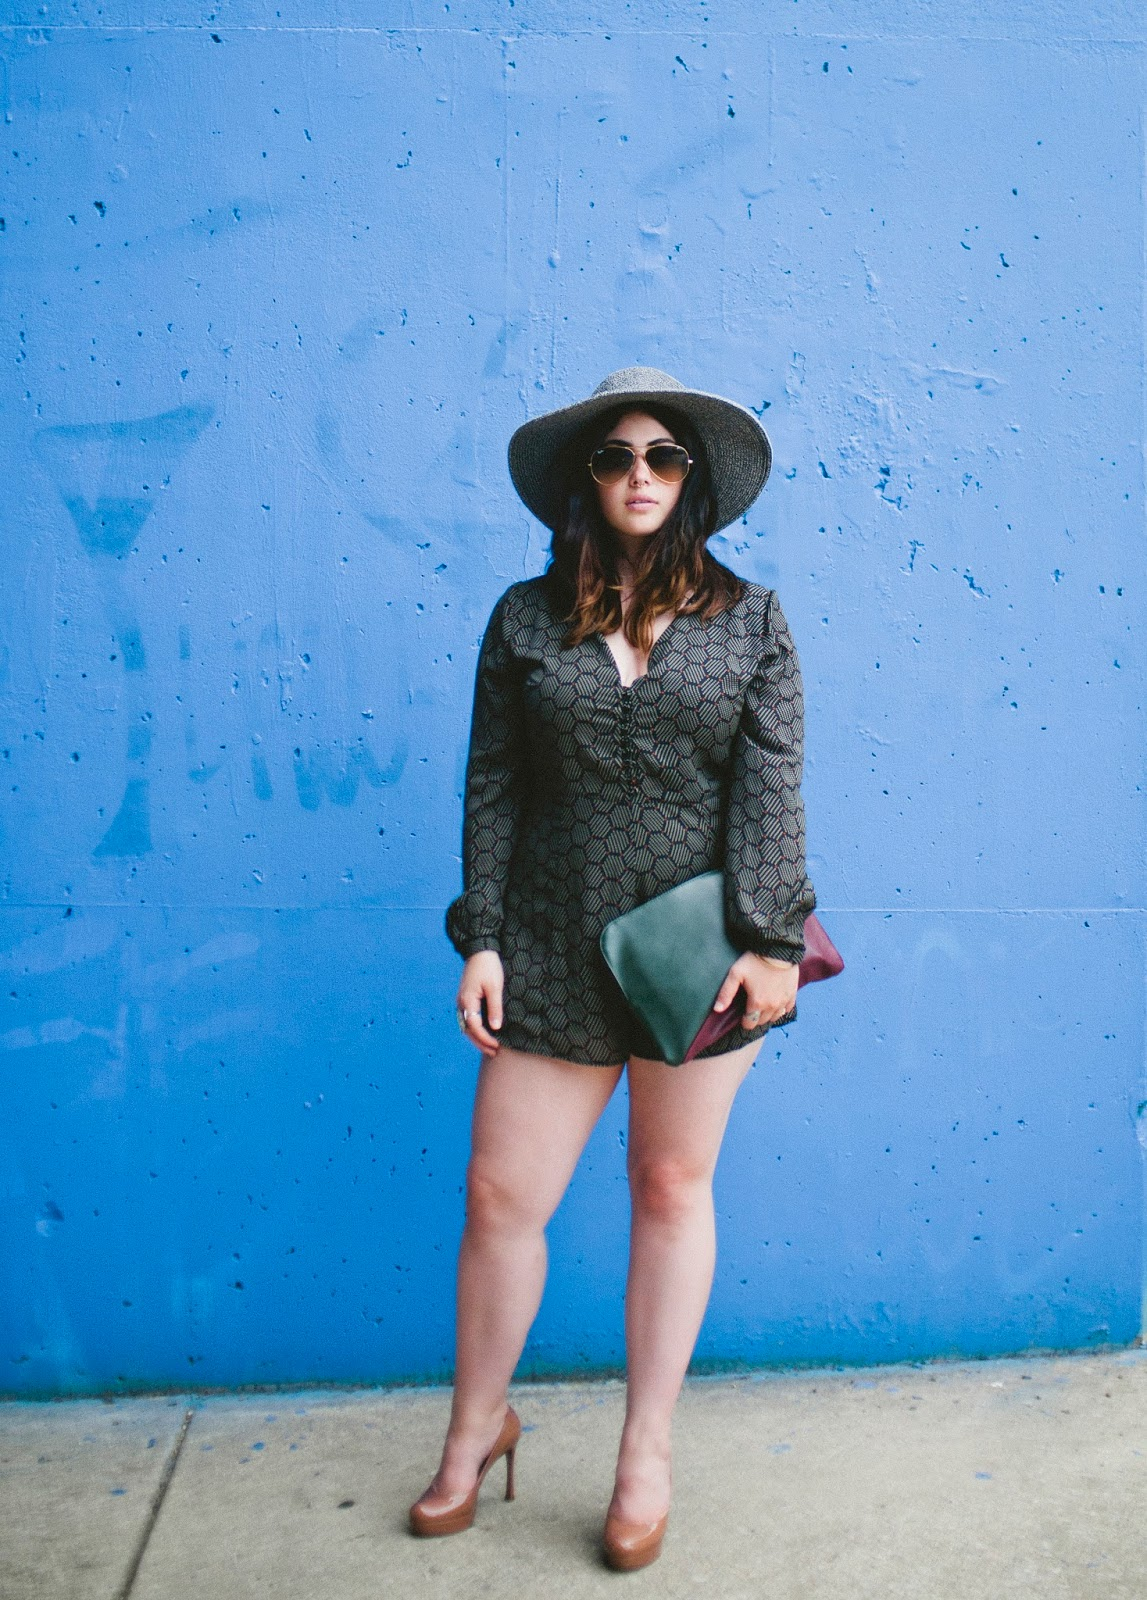 Philadelphia, fashion, blog, E.M., Ricchini, Erika, romper, anthropologie, YSL, pumps, nude,